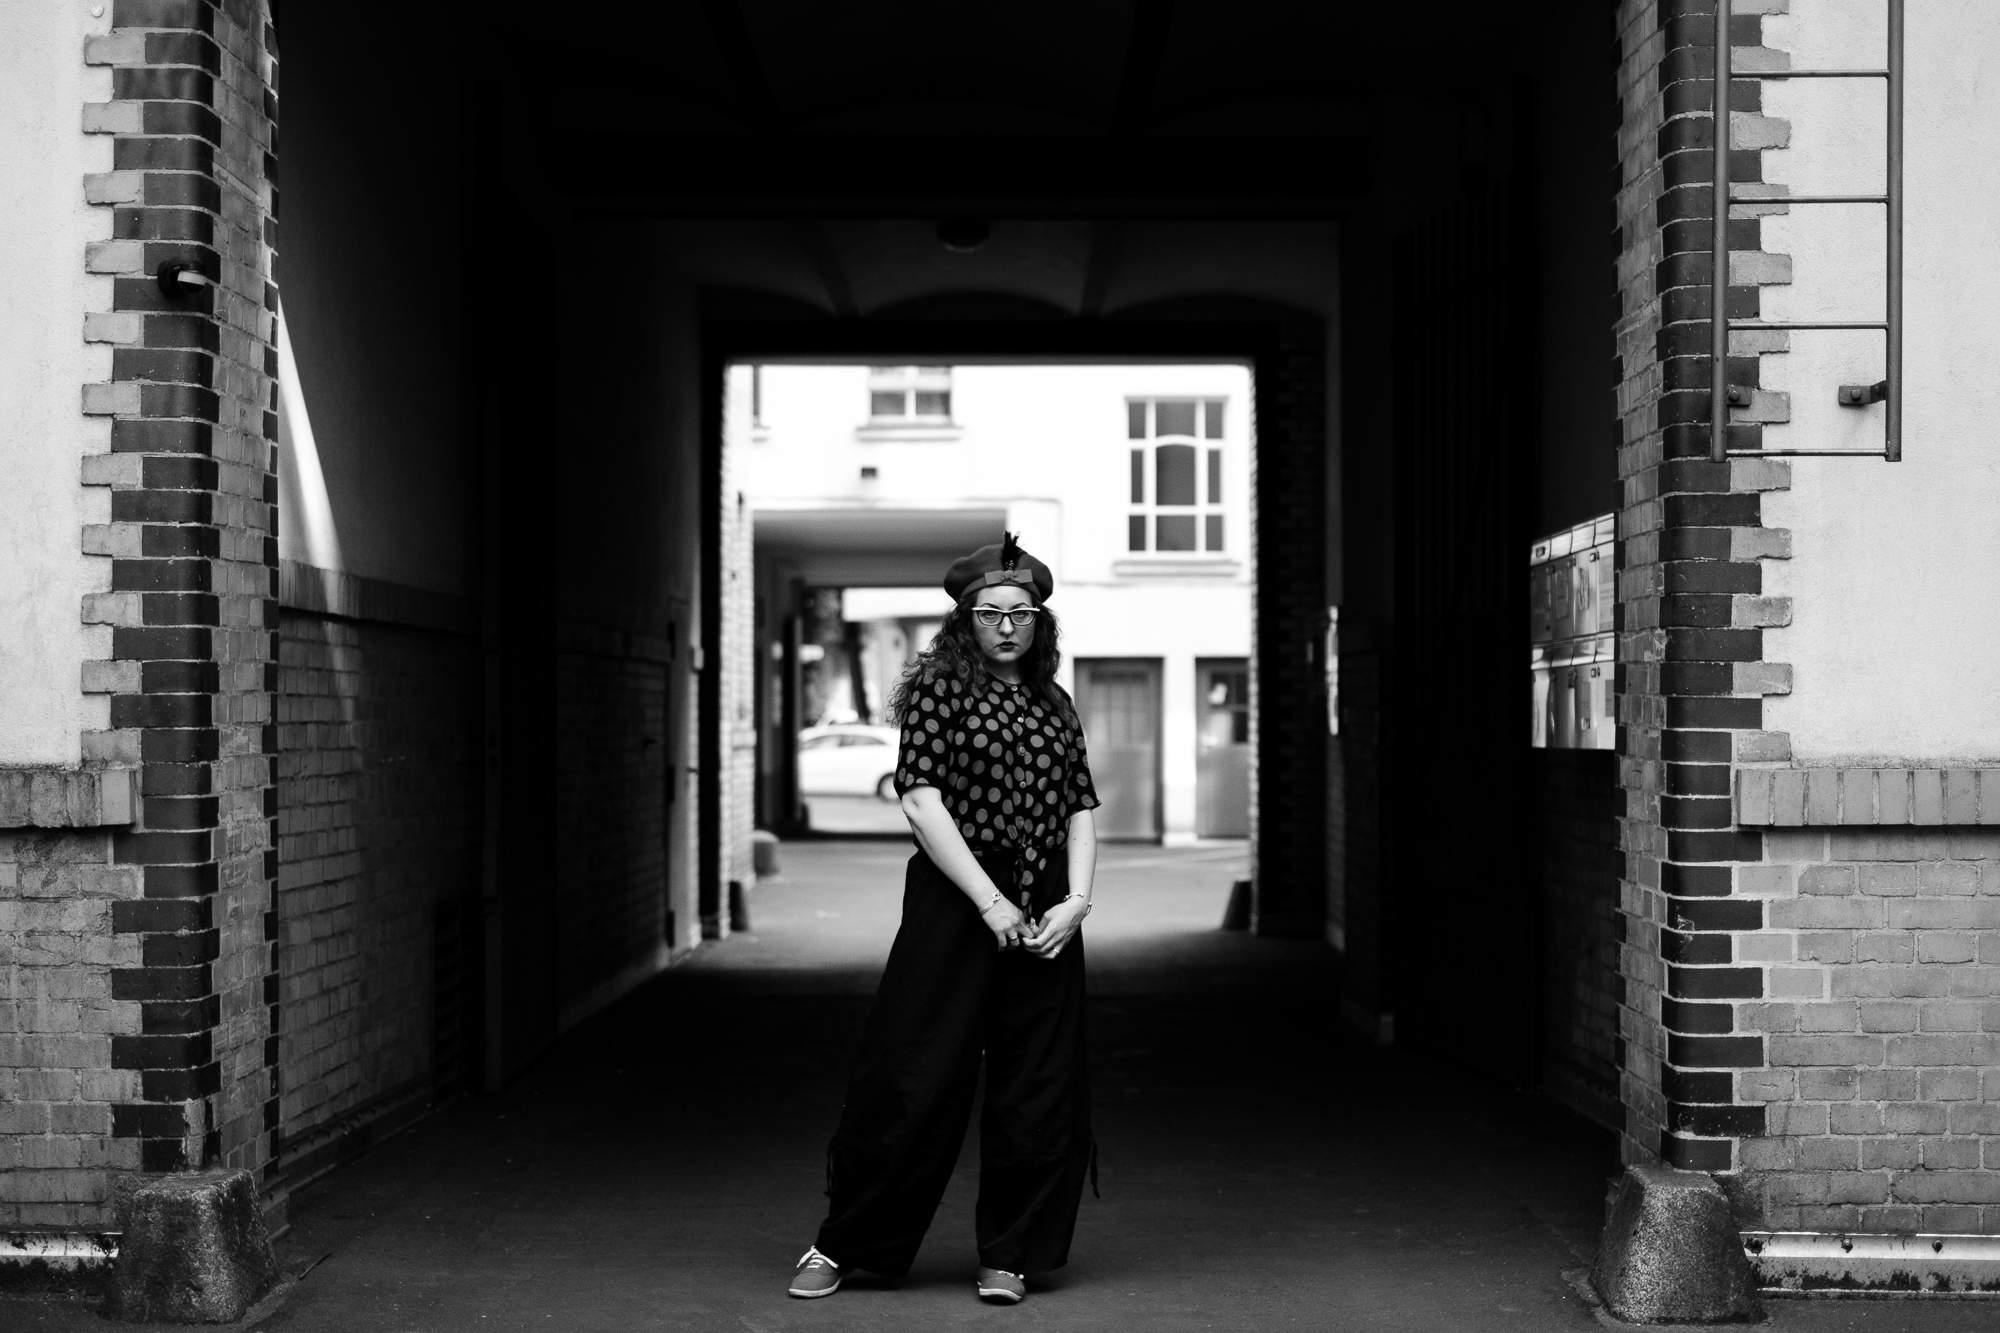 Girl posing in underpass